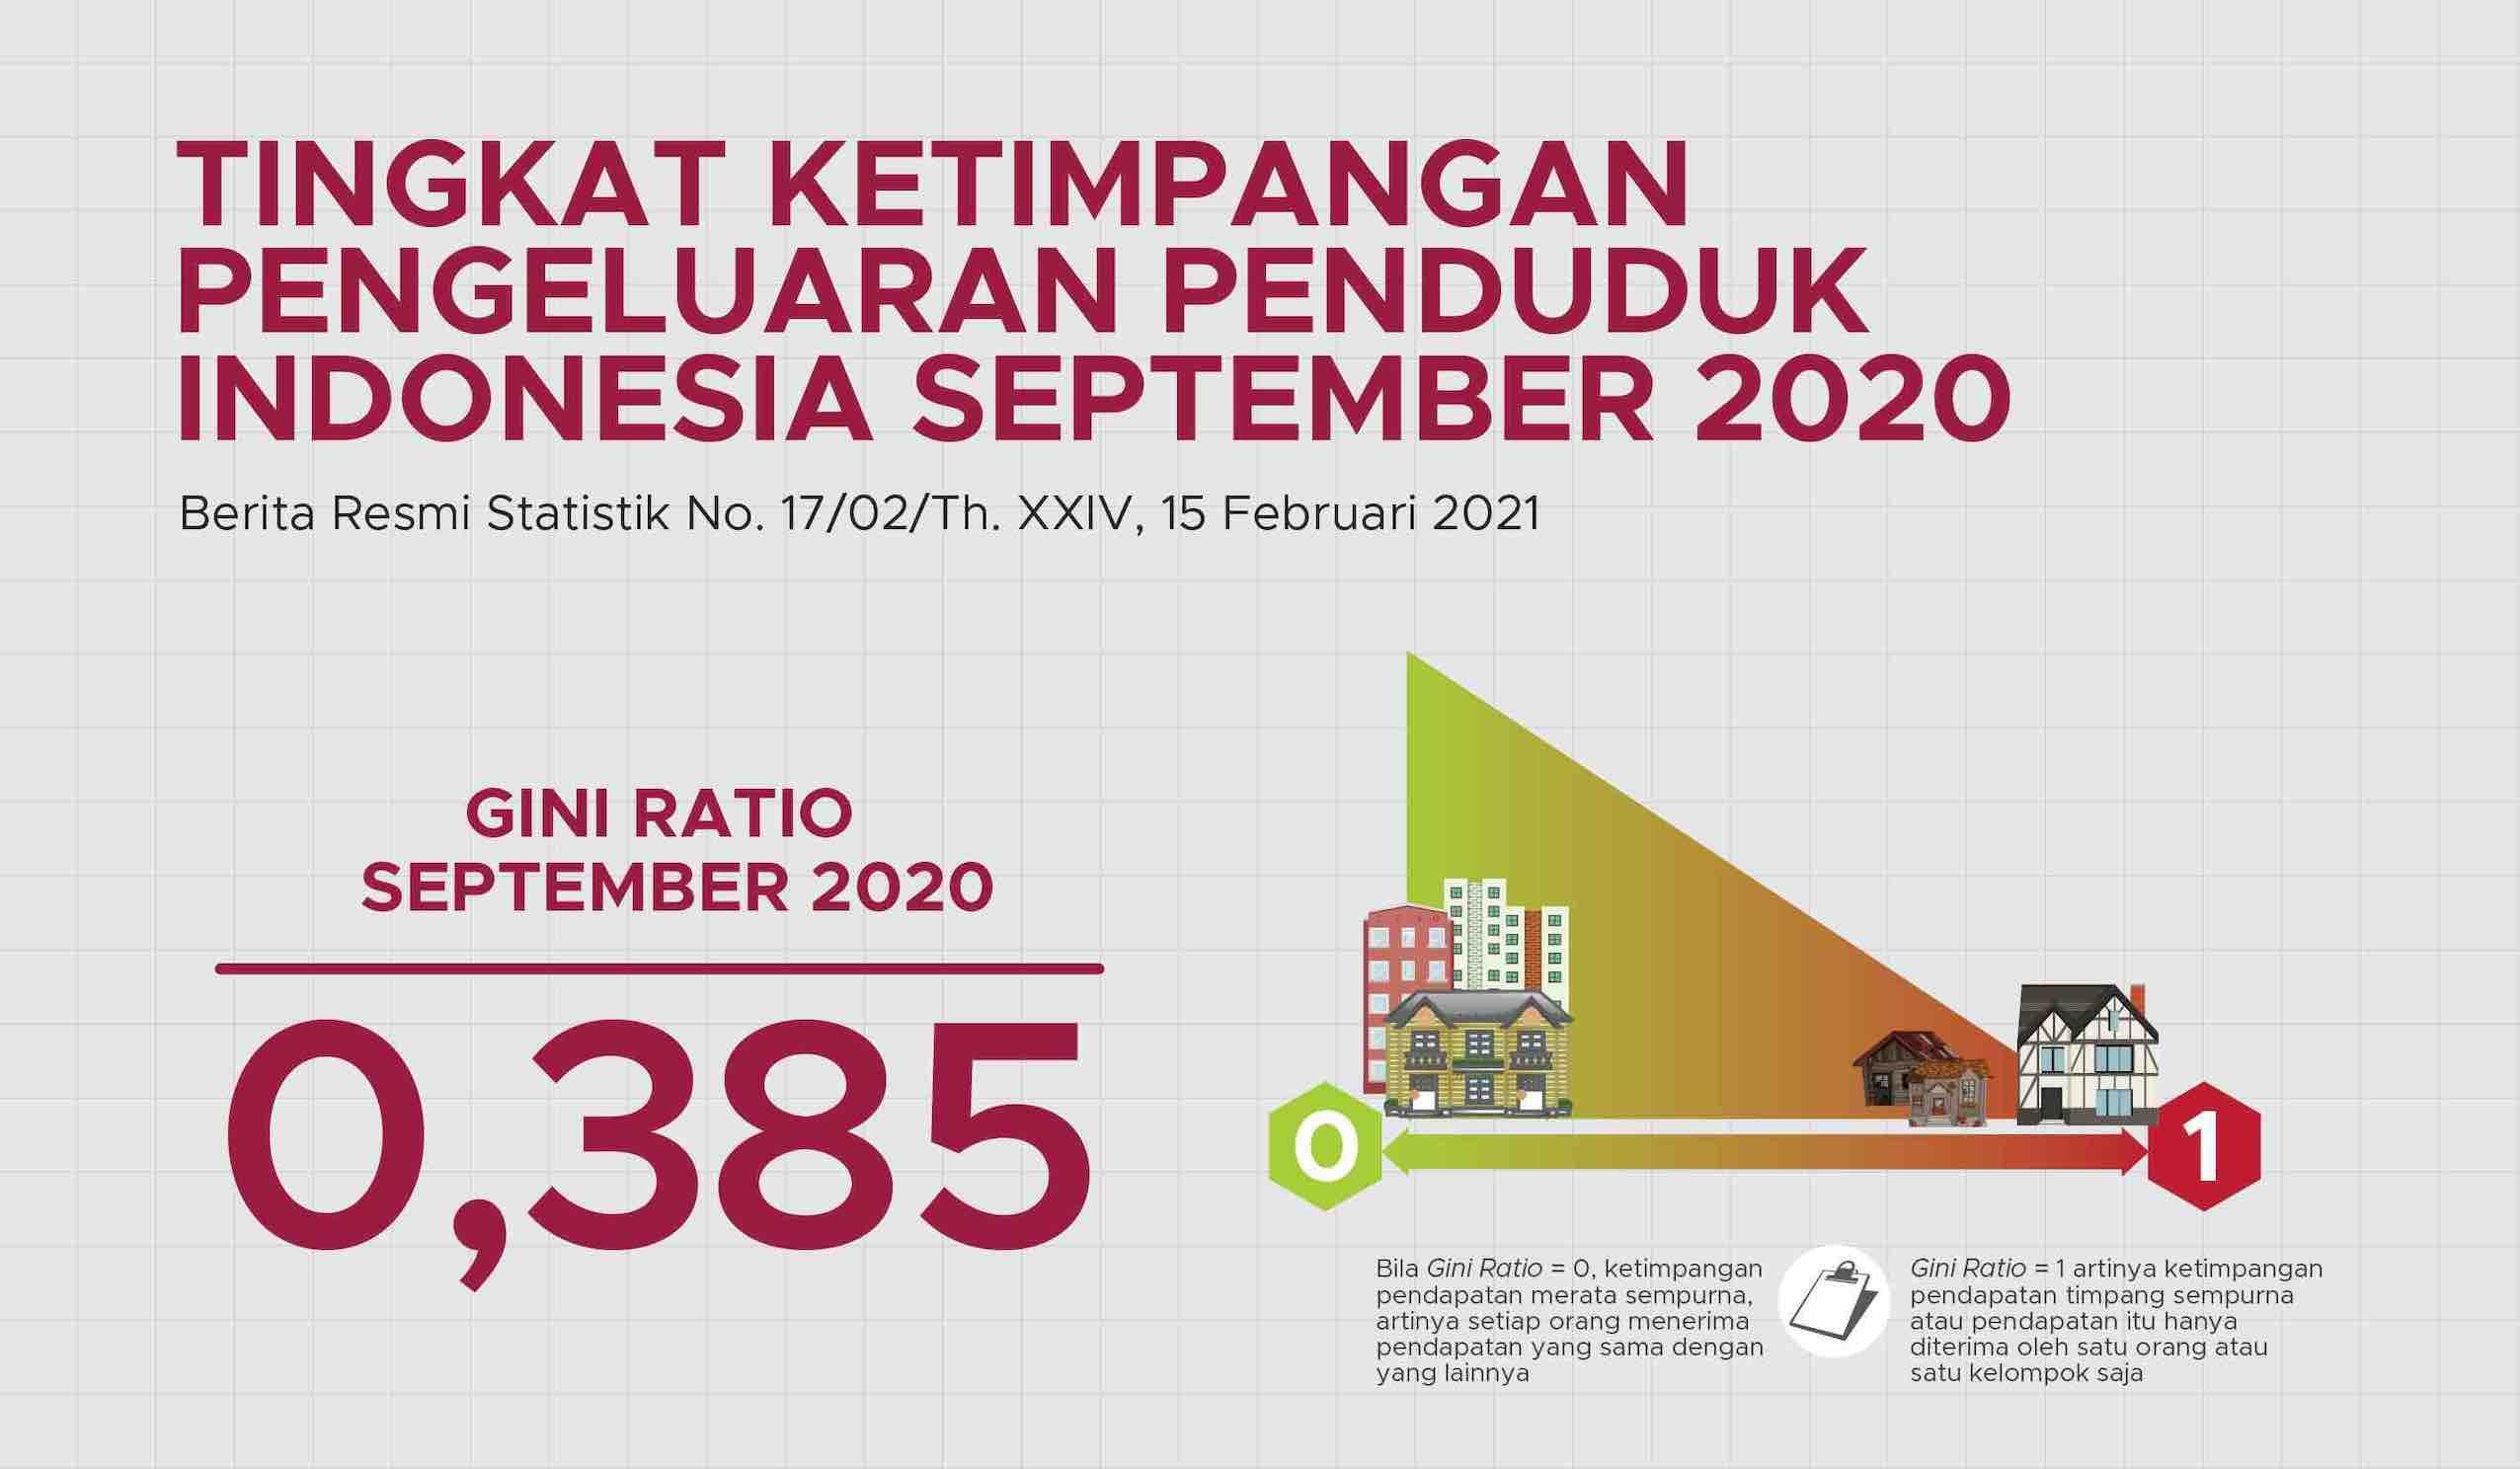 Ketimpangan ekonomi di Indonesia meningkat selama 2020